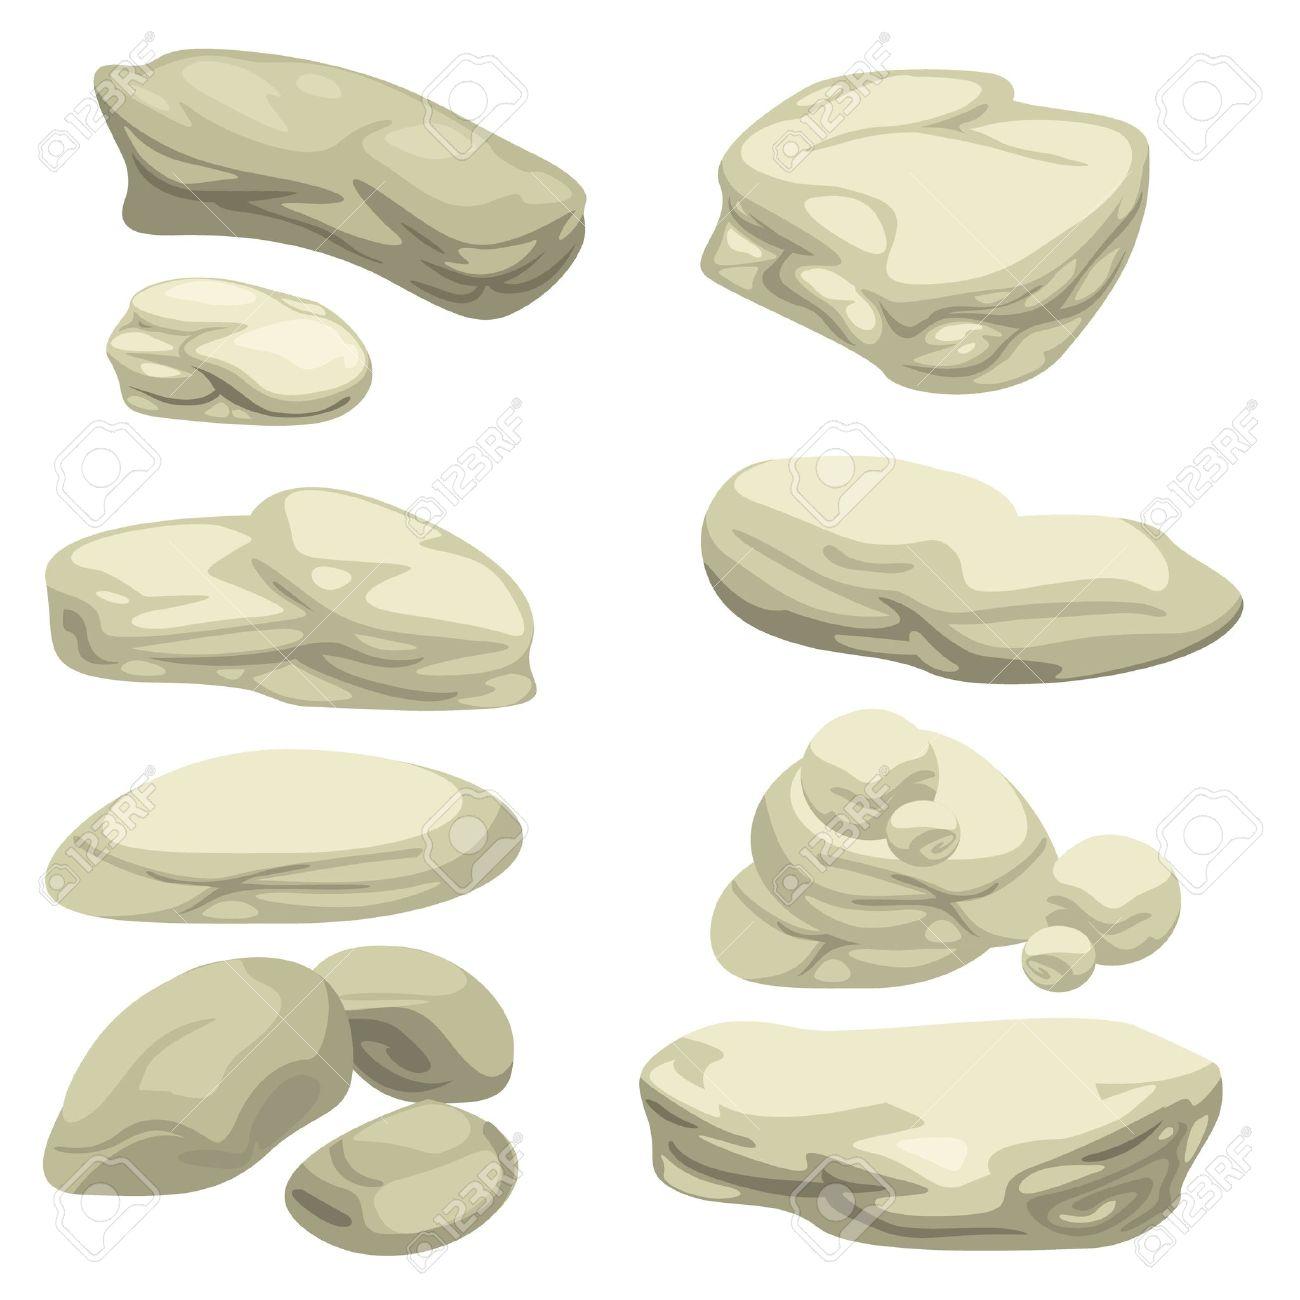 stone set illustrator Stock Vector - 12125400